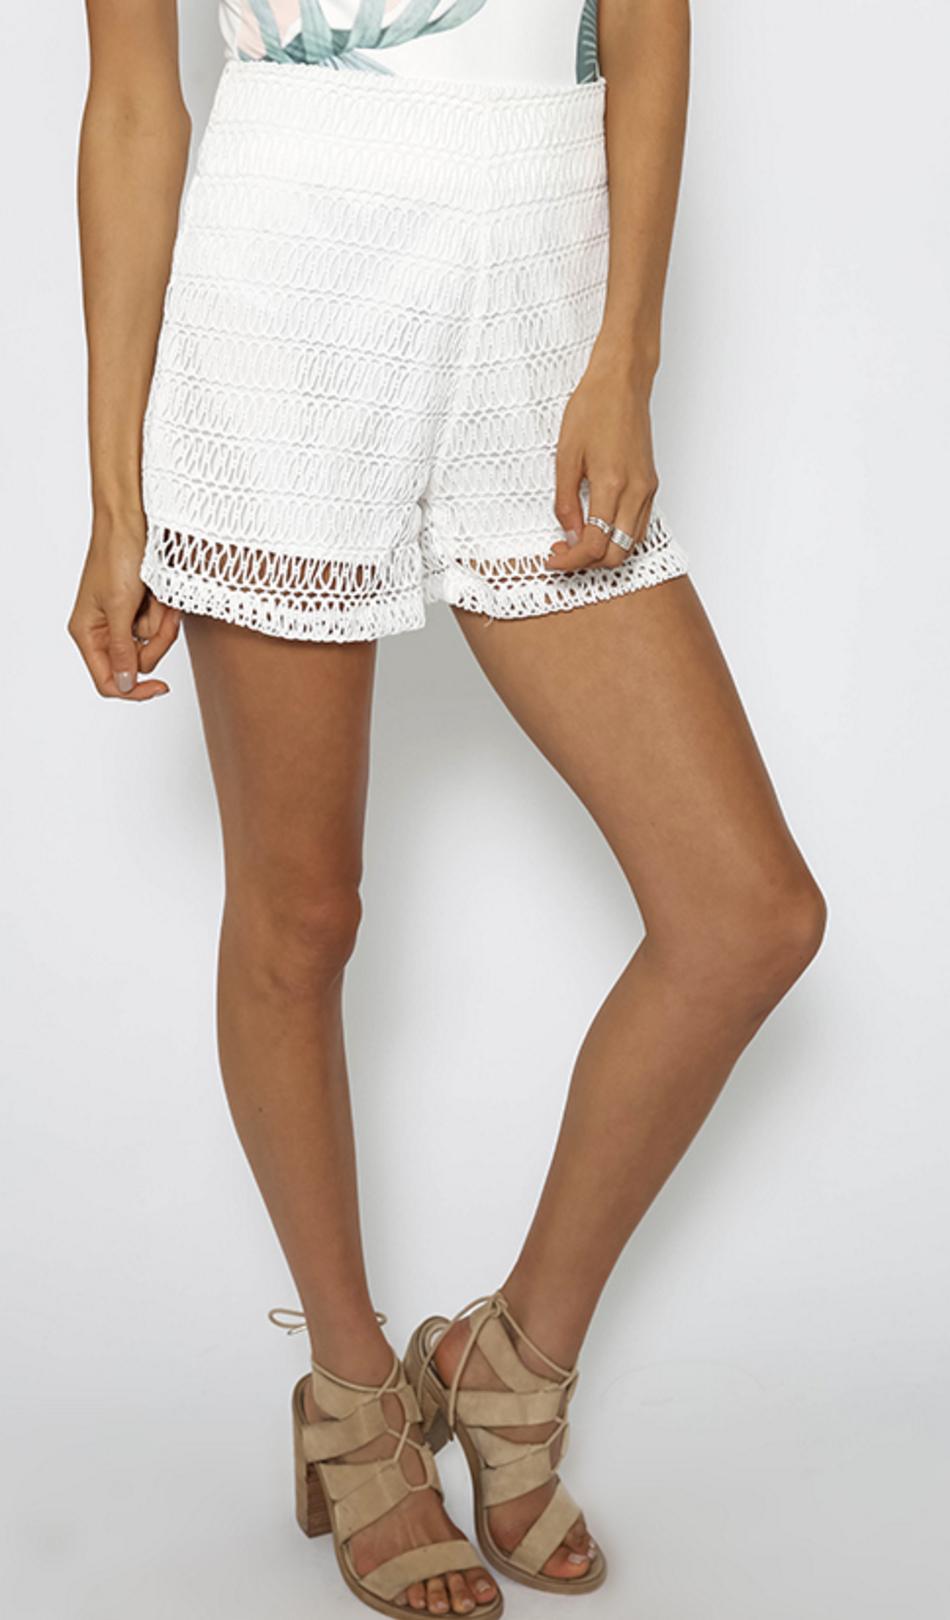 Cynthia Rose shorts $45